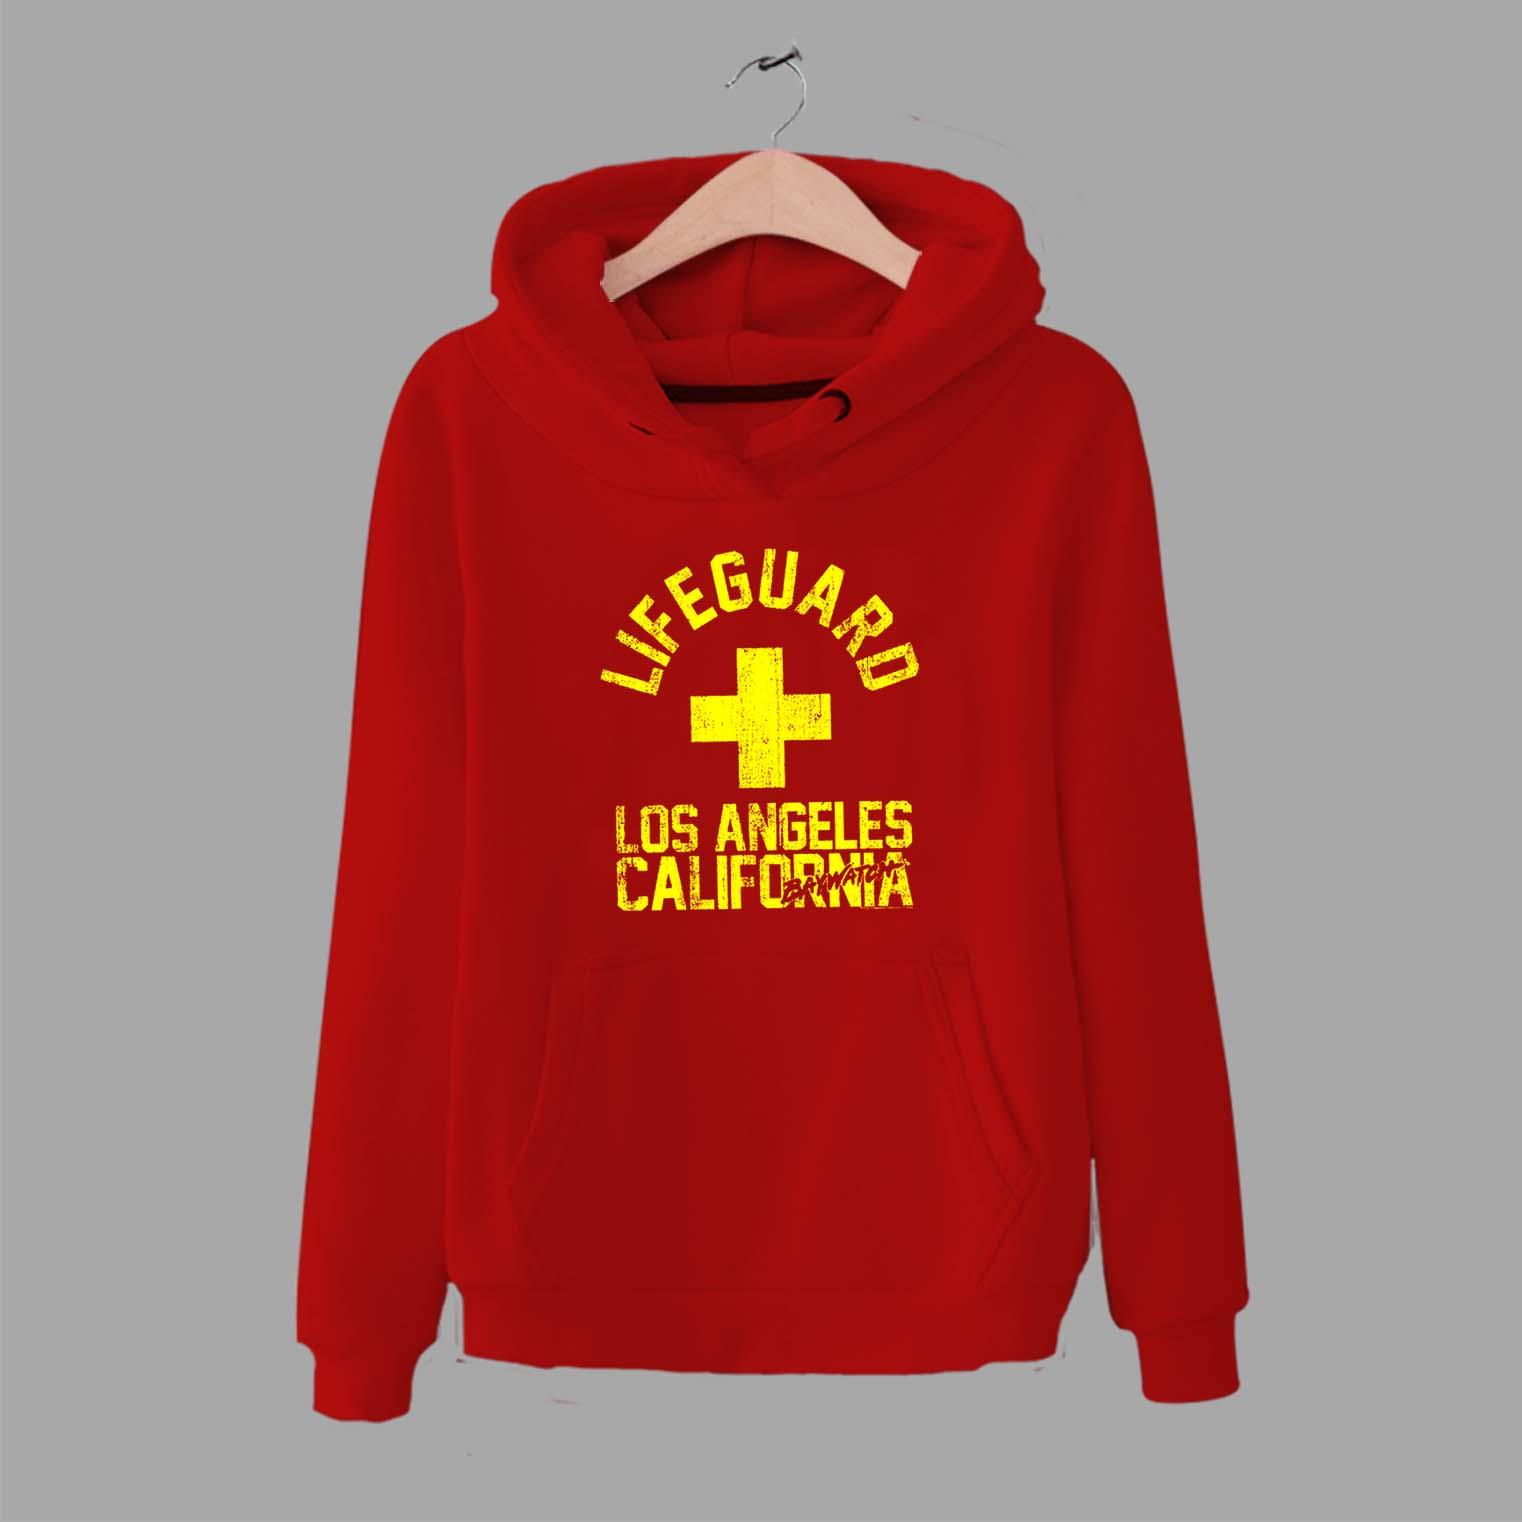 25462fc94c92 Baywatch lifeguard los angeles california hoodie streetwear hotvero jpg  1522x1522 California lifeguard sweater